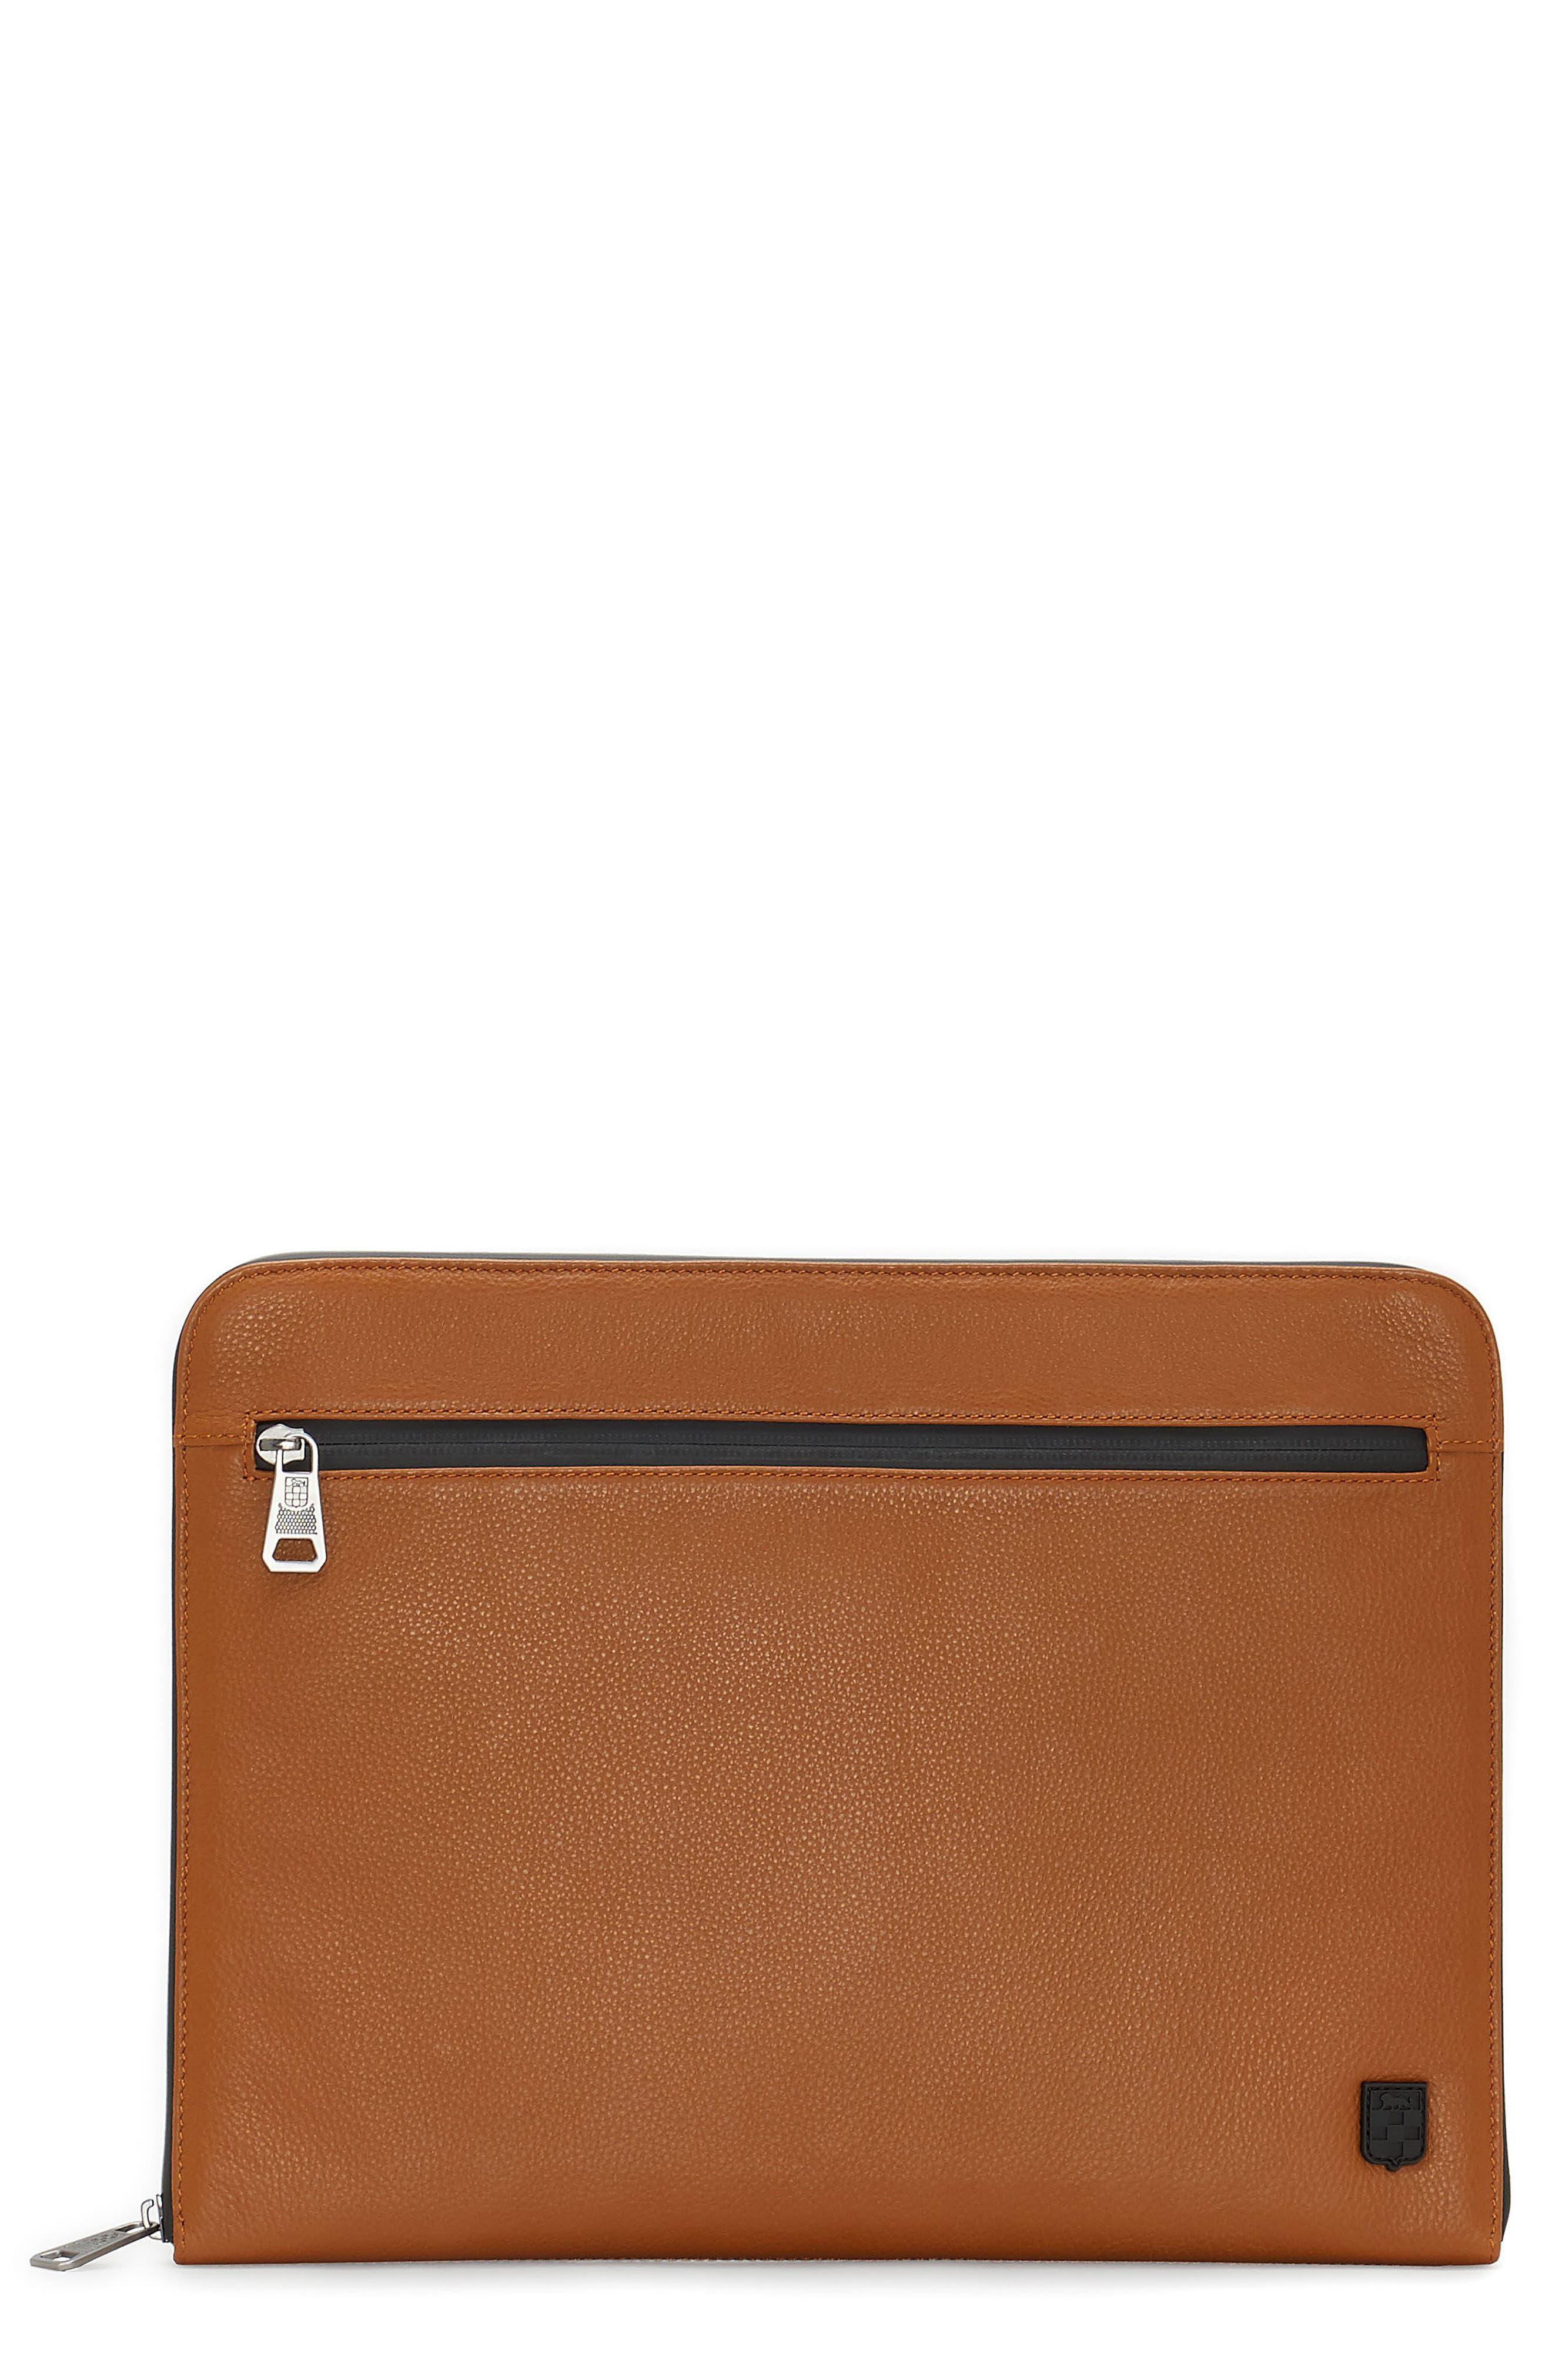 Purio Leather Portfolio,                             Main thumbnail 1, color,                             201